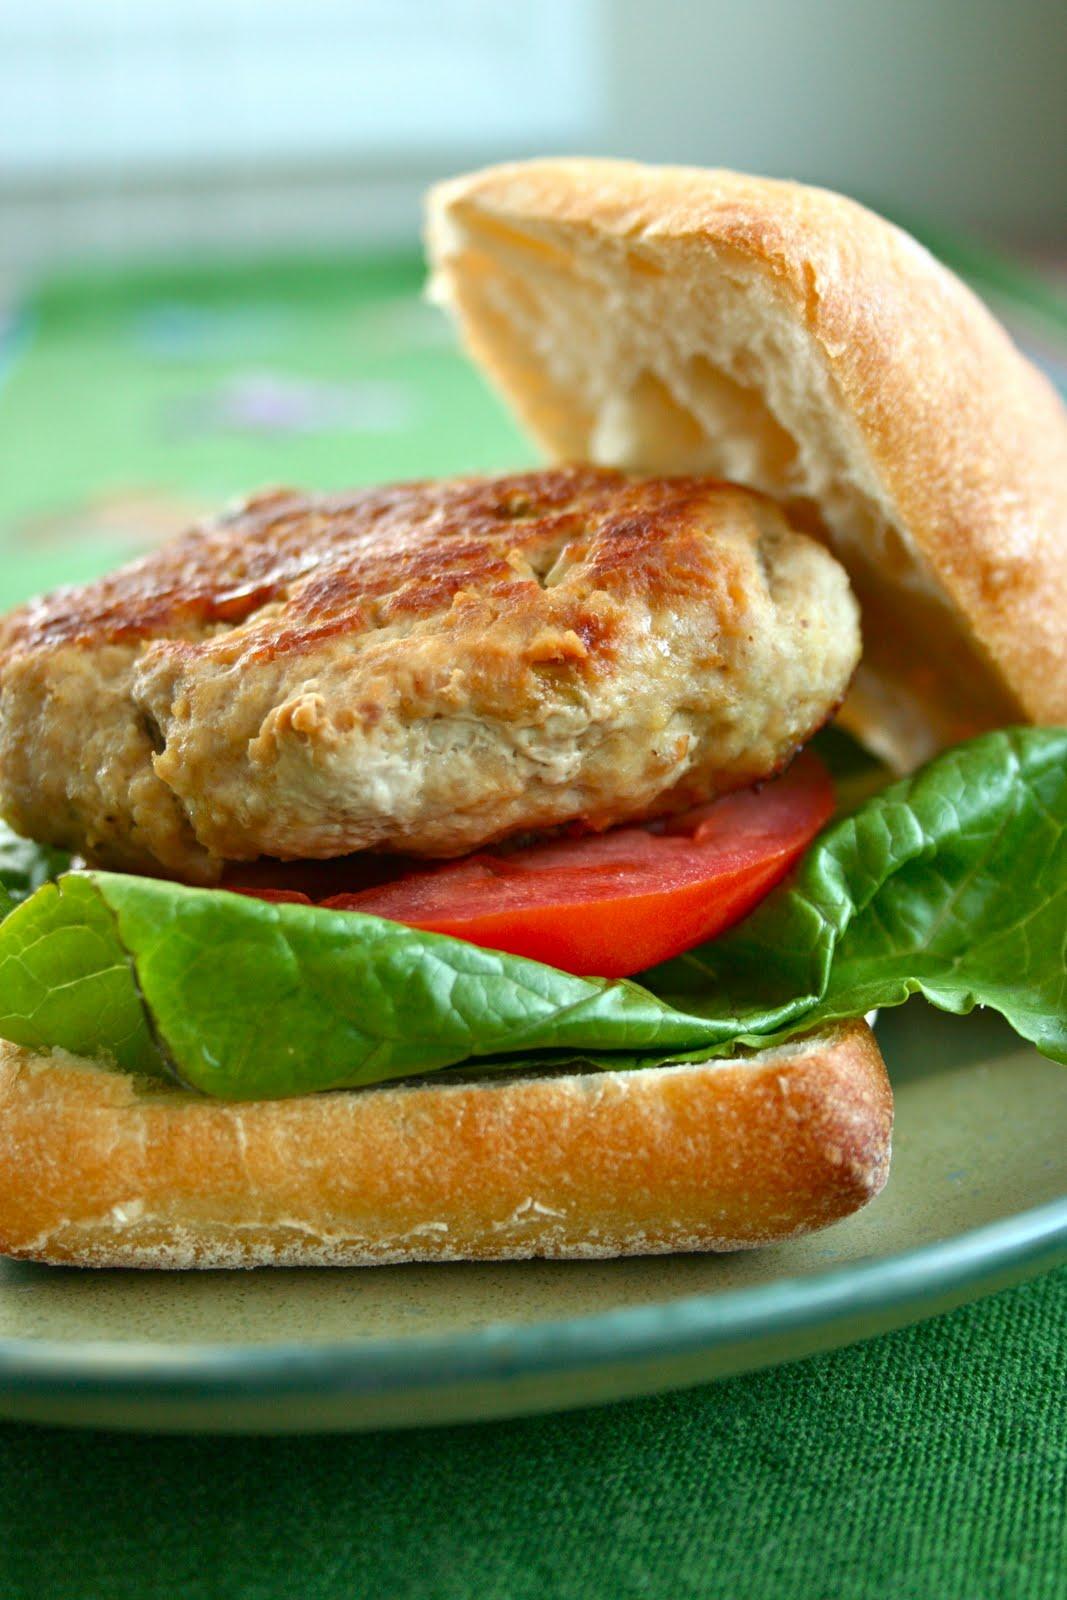 ... 101: Cookbook Review - Favorite Turkey Burger with Basil Aioli